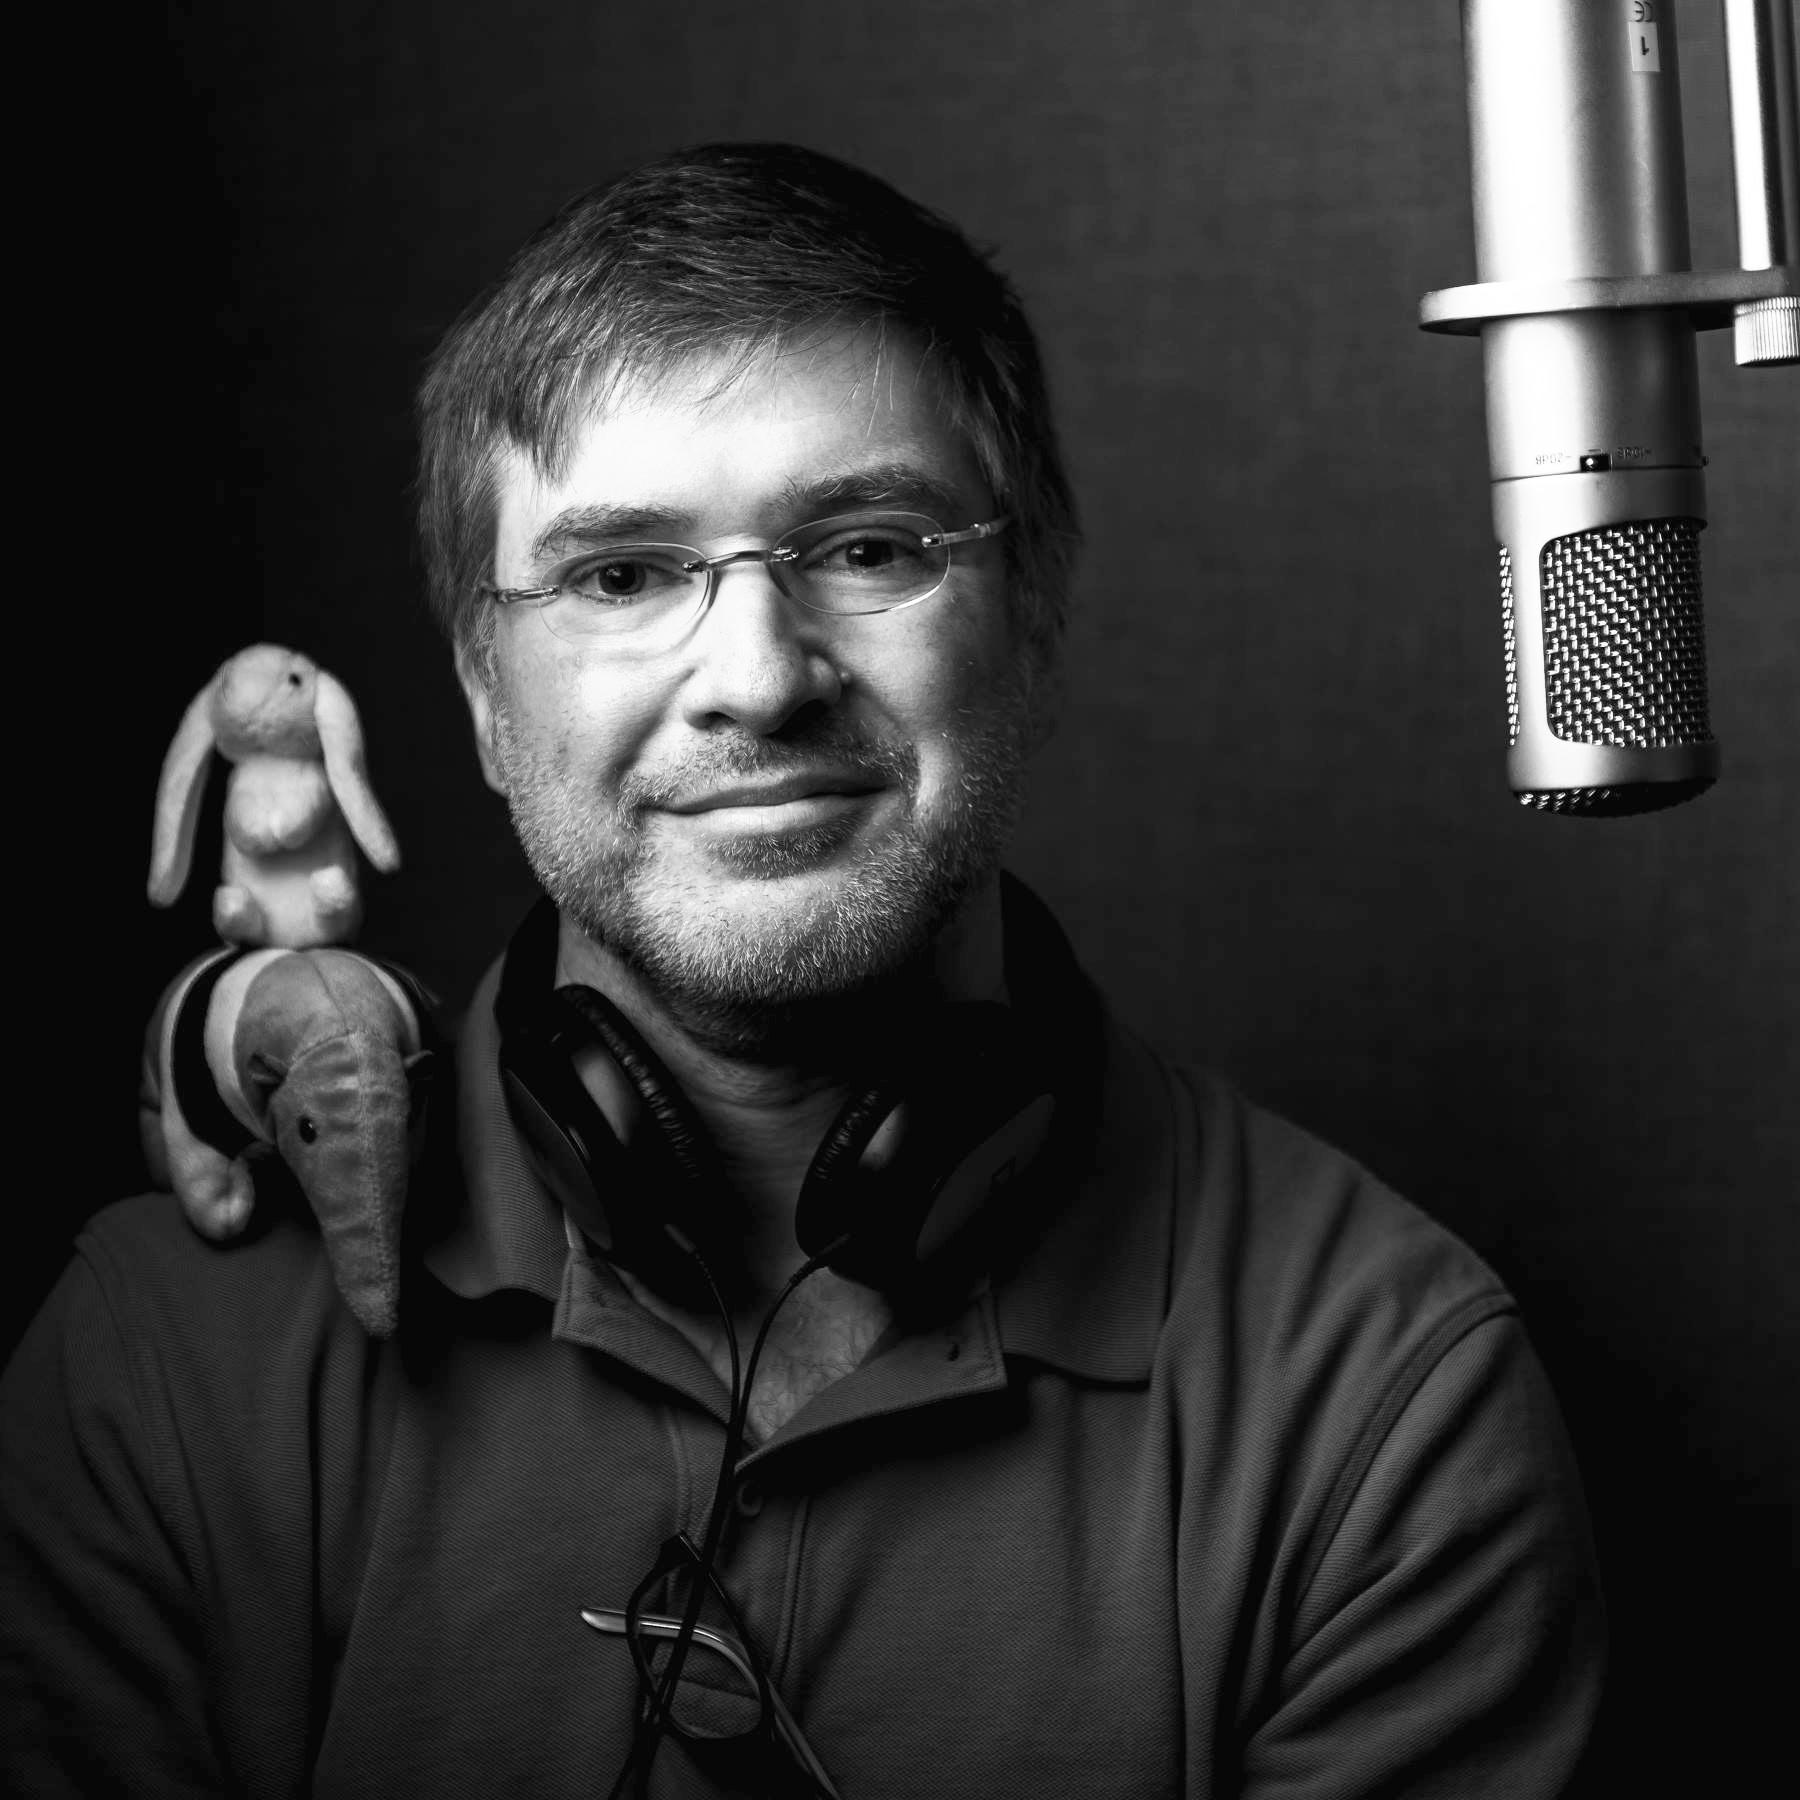 Acclaimed vocal artist Christopher Lane